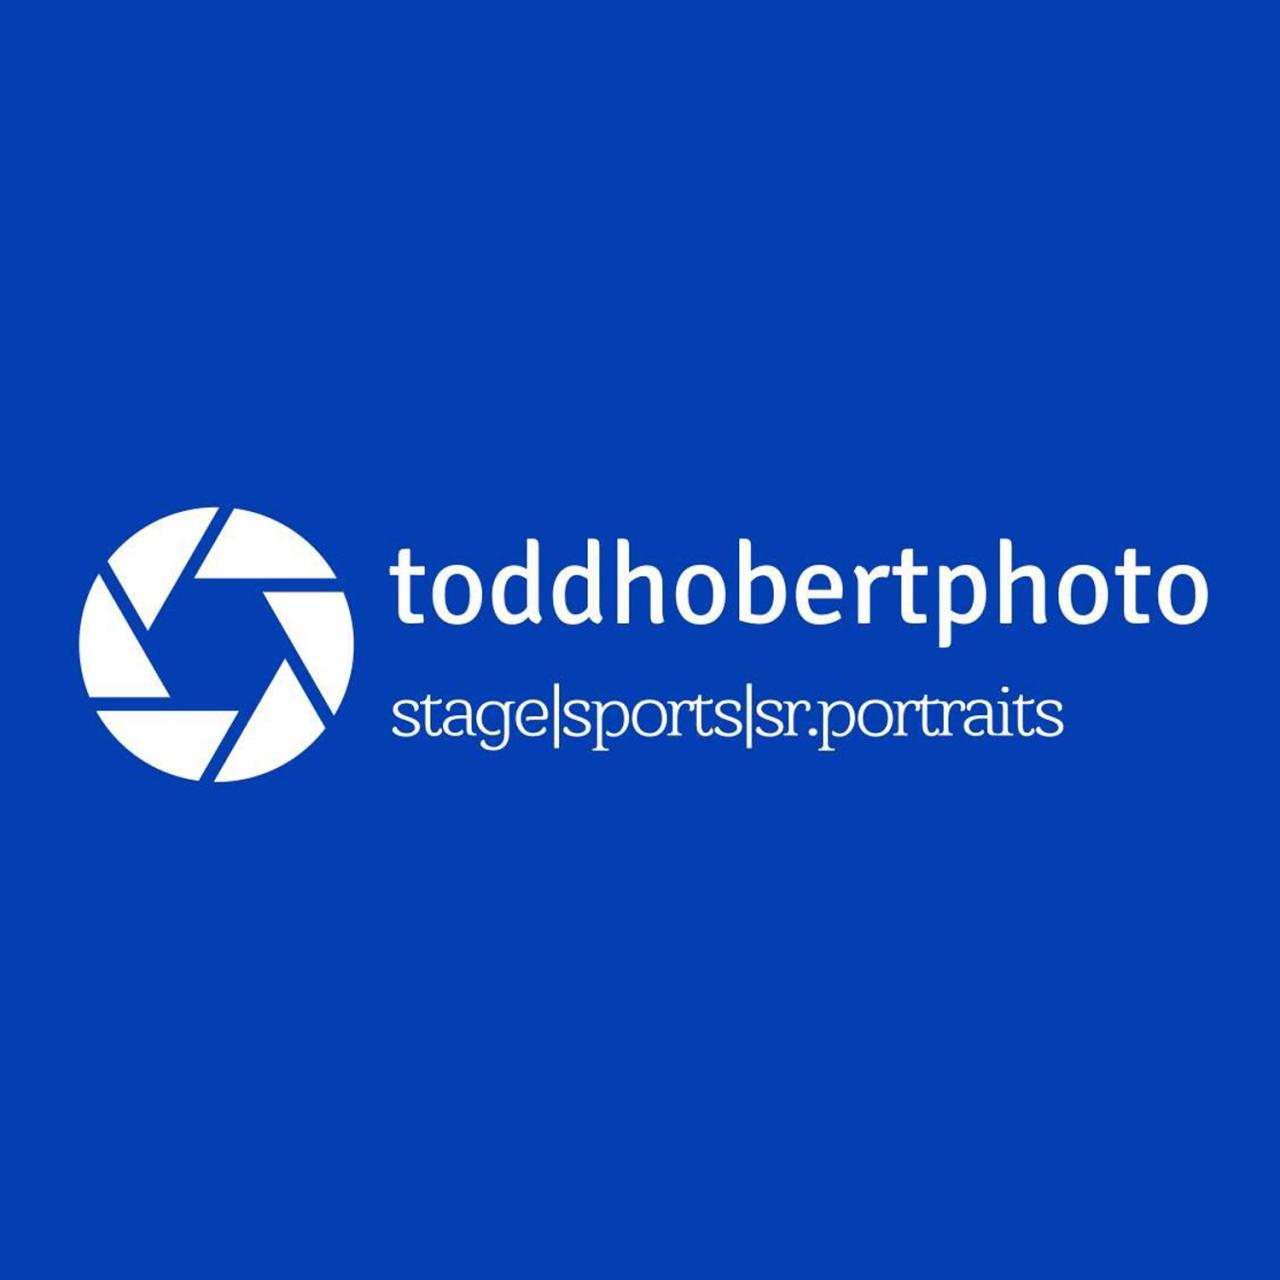 Todd Hobert Photography